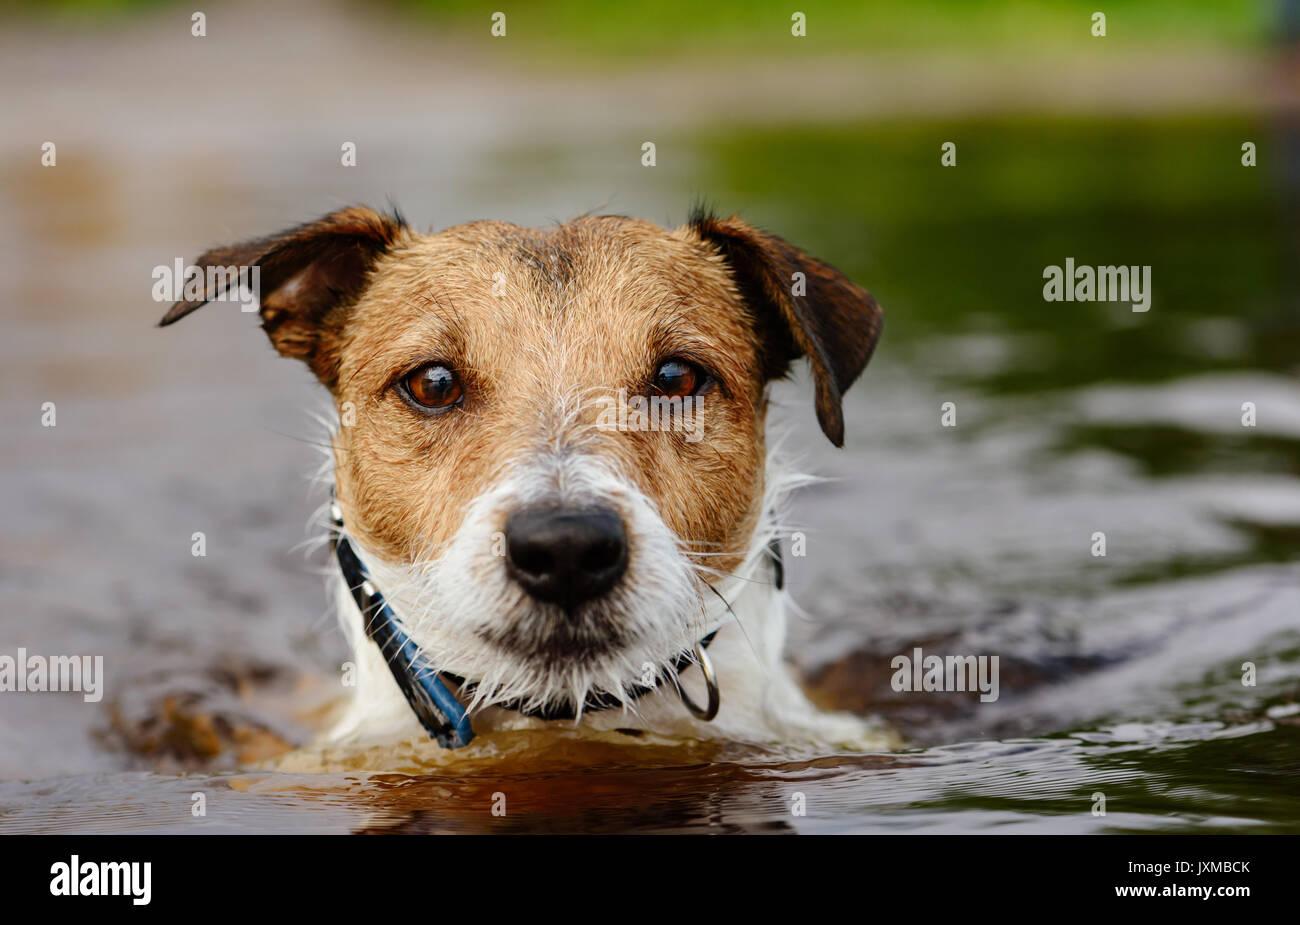 Play Dog Head Stock Photos & Play Dog Head Stock Images ...